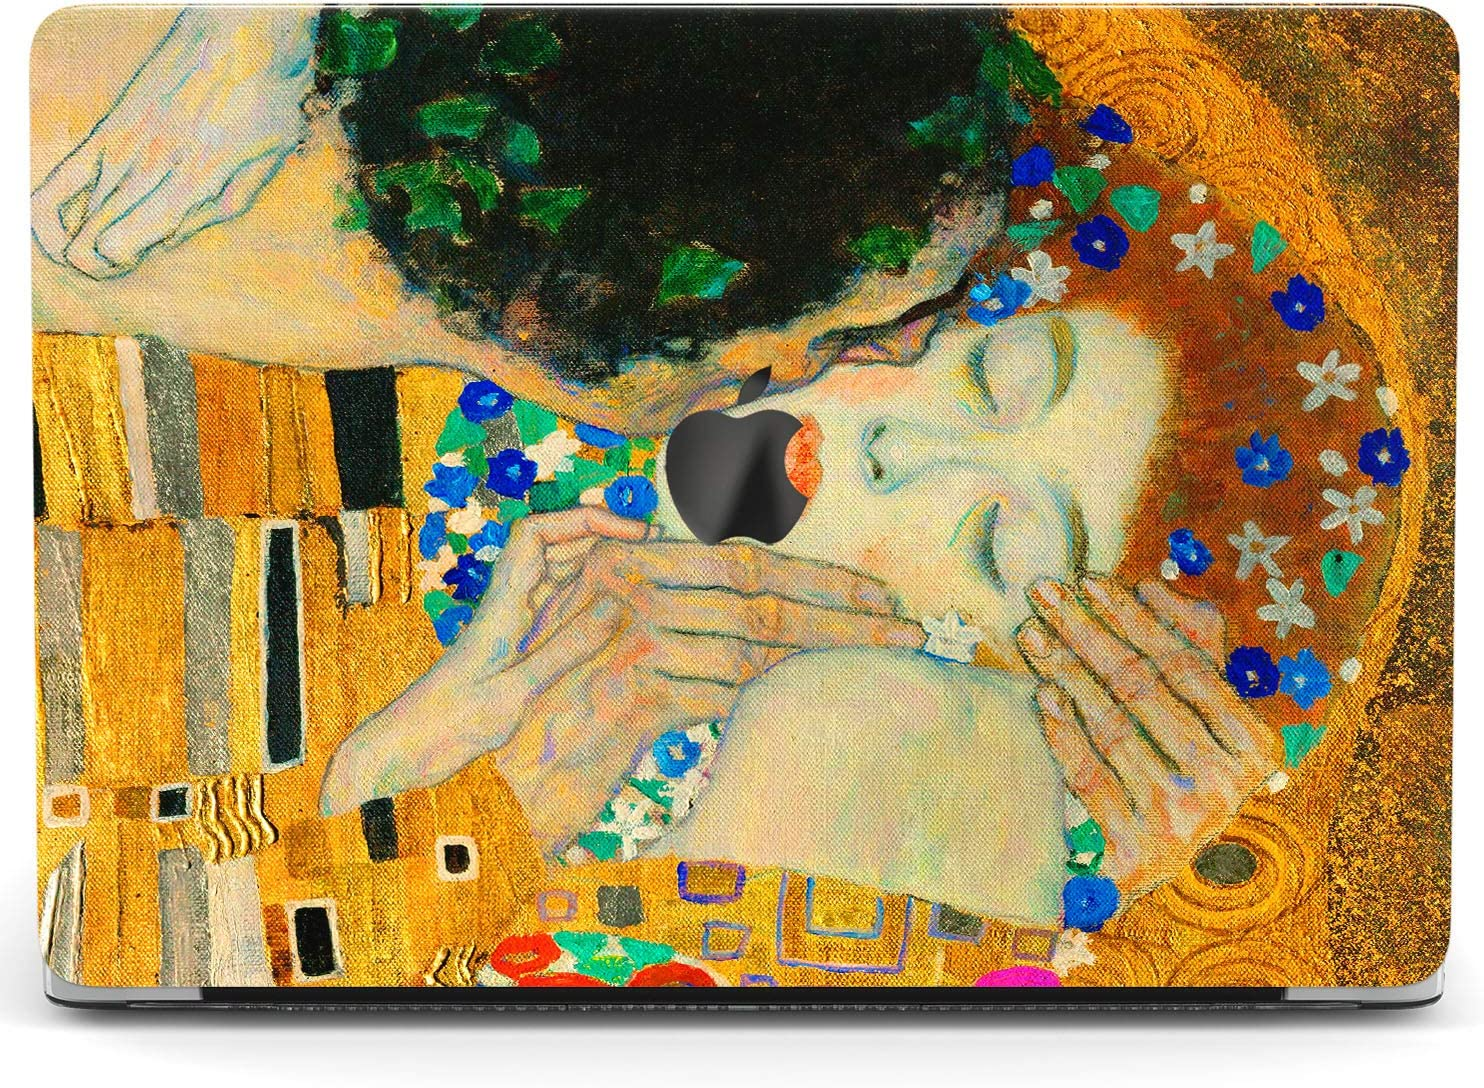 Wonder Wild Case for MacBook Air 13 inch Pro 15 2019 2018 Retina 12 11 Apple Hard Mac Protective Cover Touch Bar 2017 2016 2020 Plastic Laptop Print The Kiss Art Gustav Klimt Love Her Him Painting